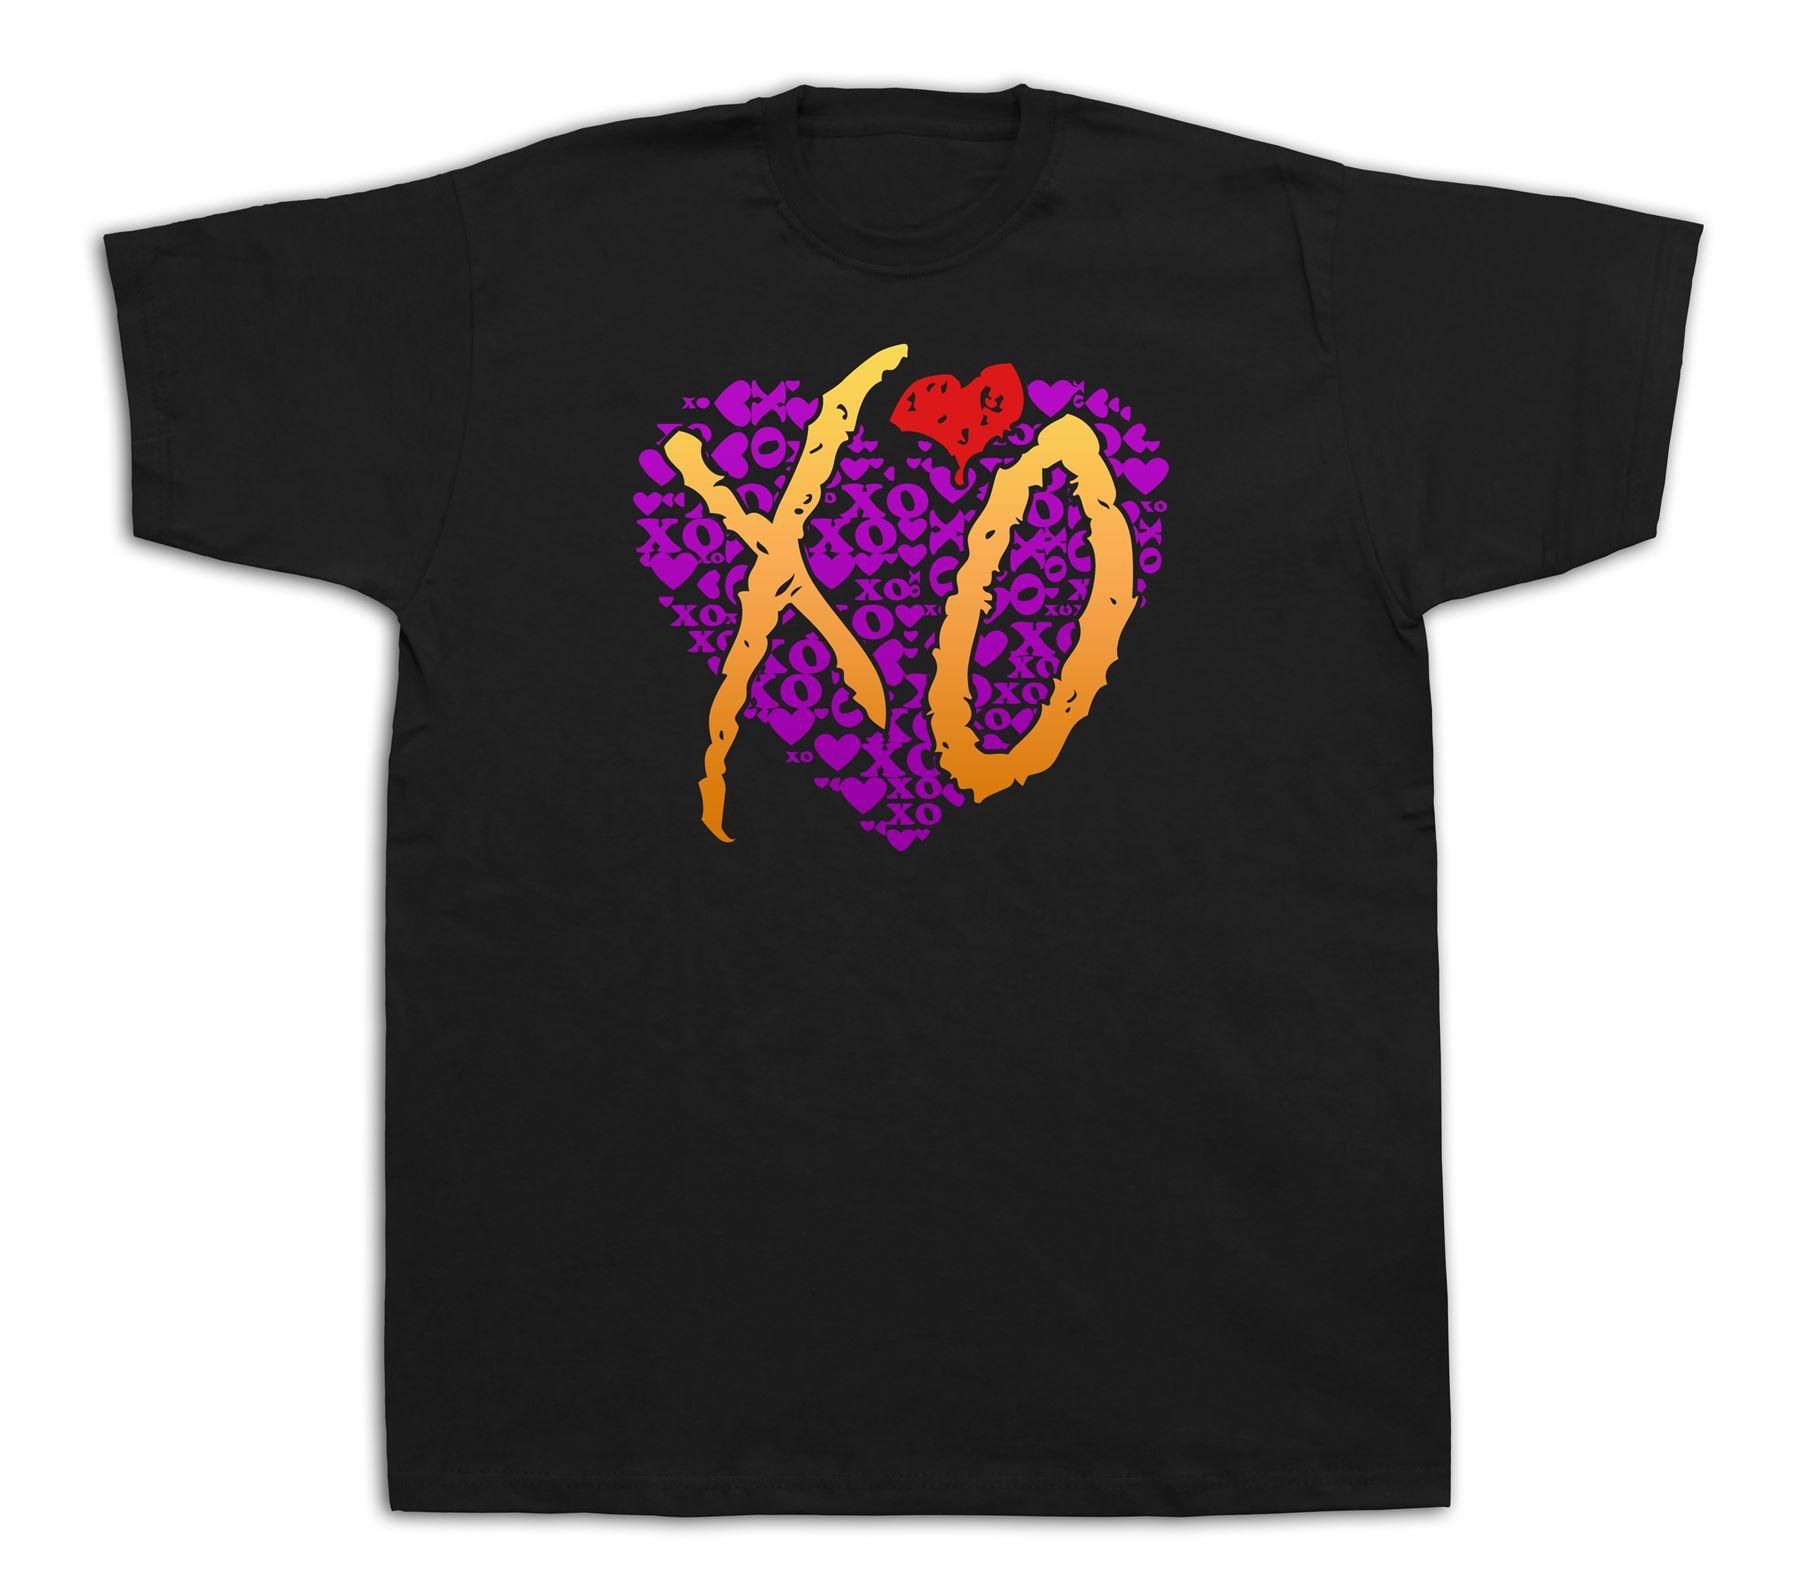 Xo amor corazón BFF amigo camisetas de algodón tee de moda gráfico de dibujos animados de impresión Cool Casual pride camiseta hombres Unisex nueva moda